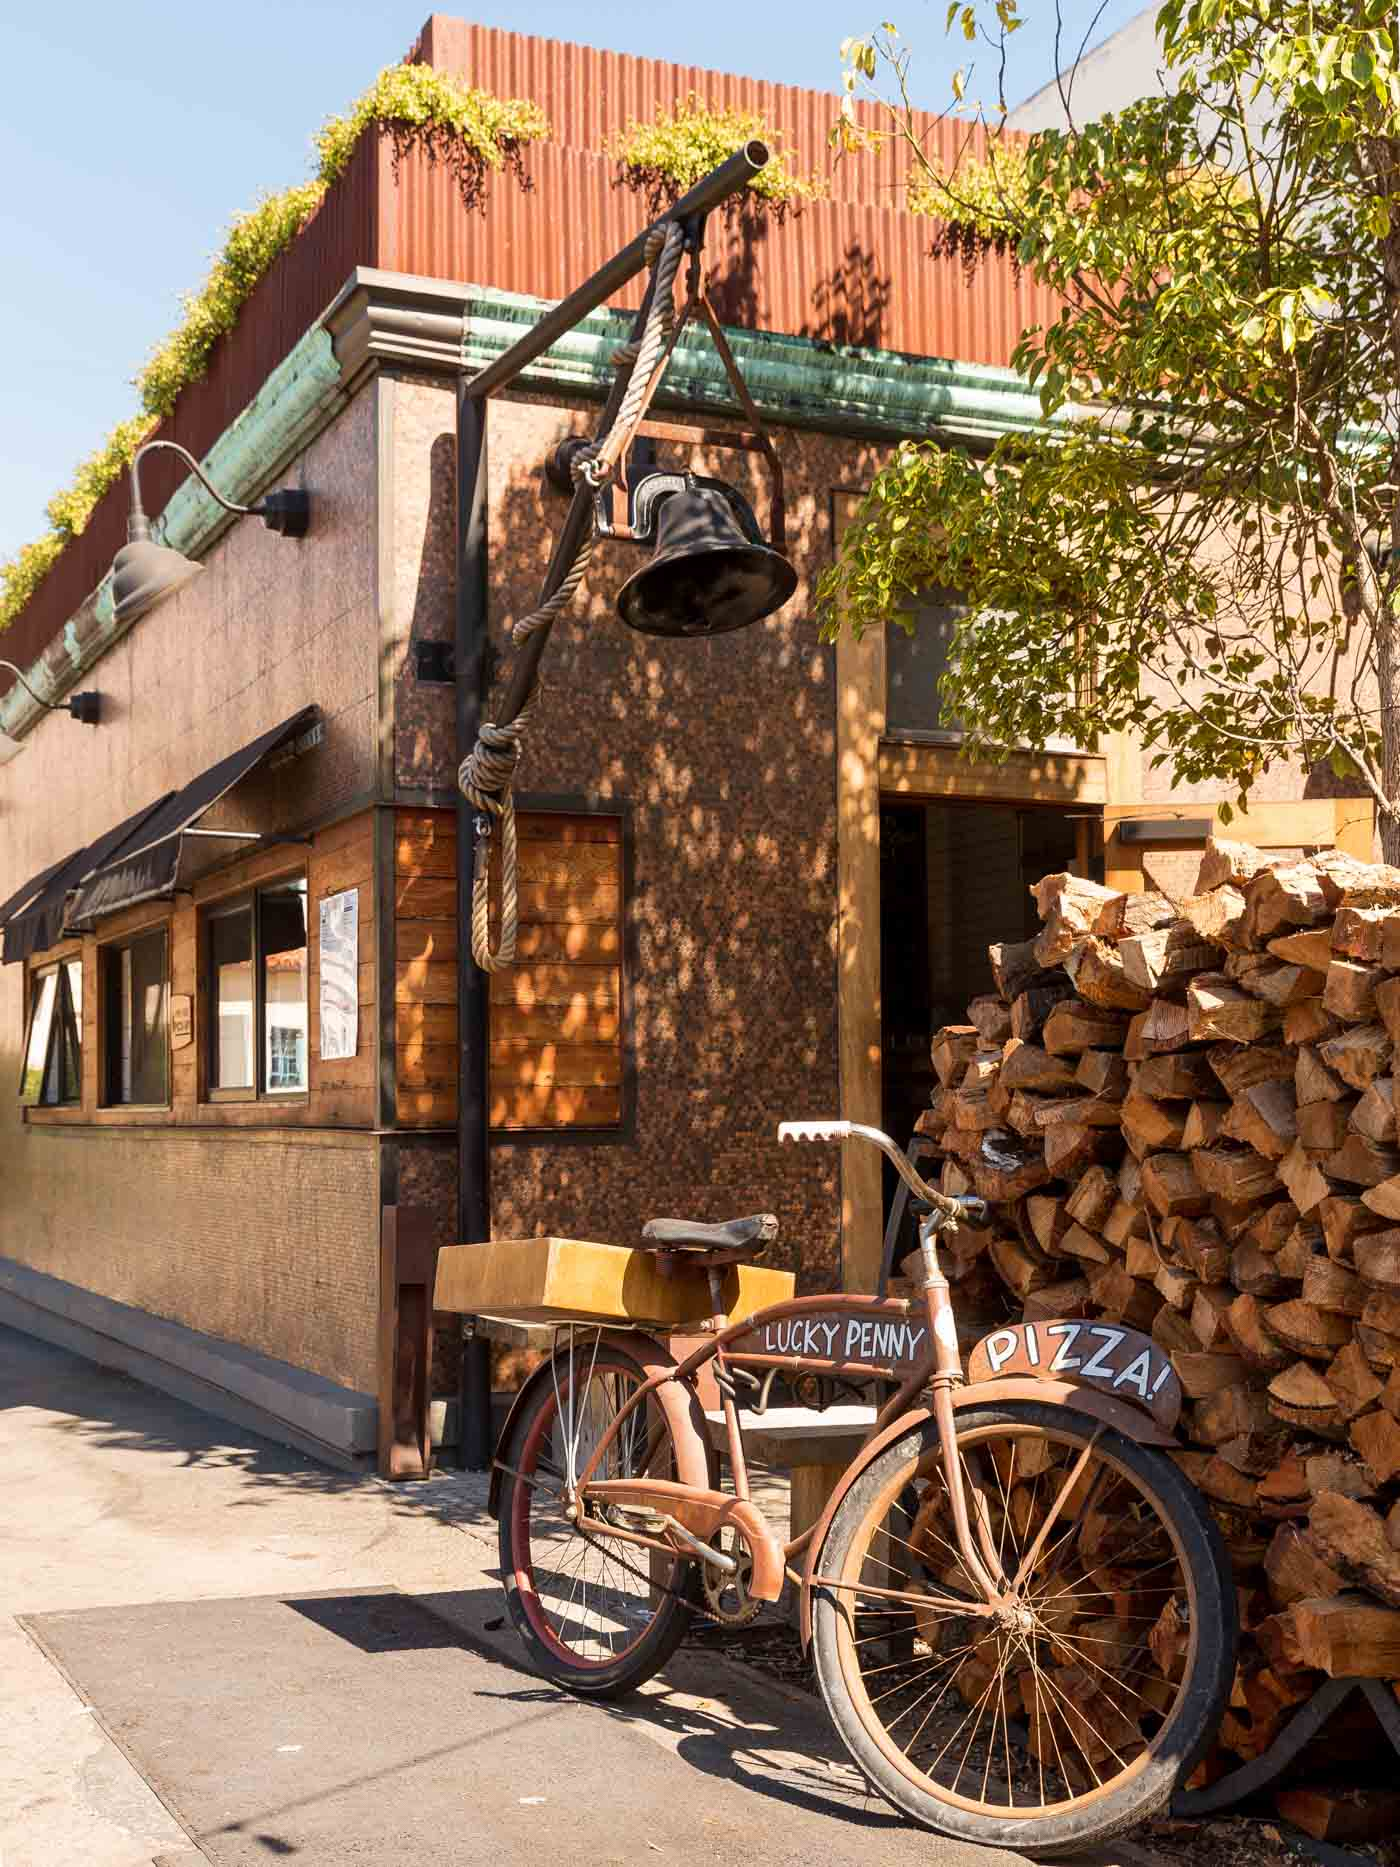 pizza, best pizza in Santa Barbara, Lucky Penny Pizza, Santa Barbara Travel Guide - My Style Vita @mystylevita